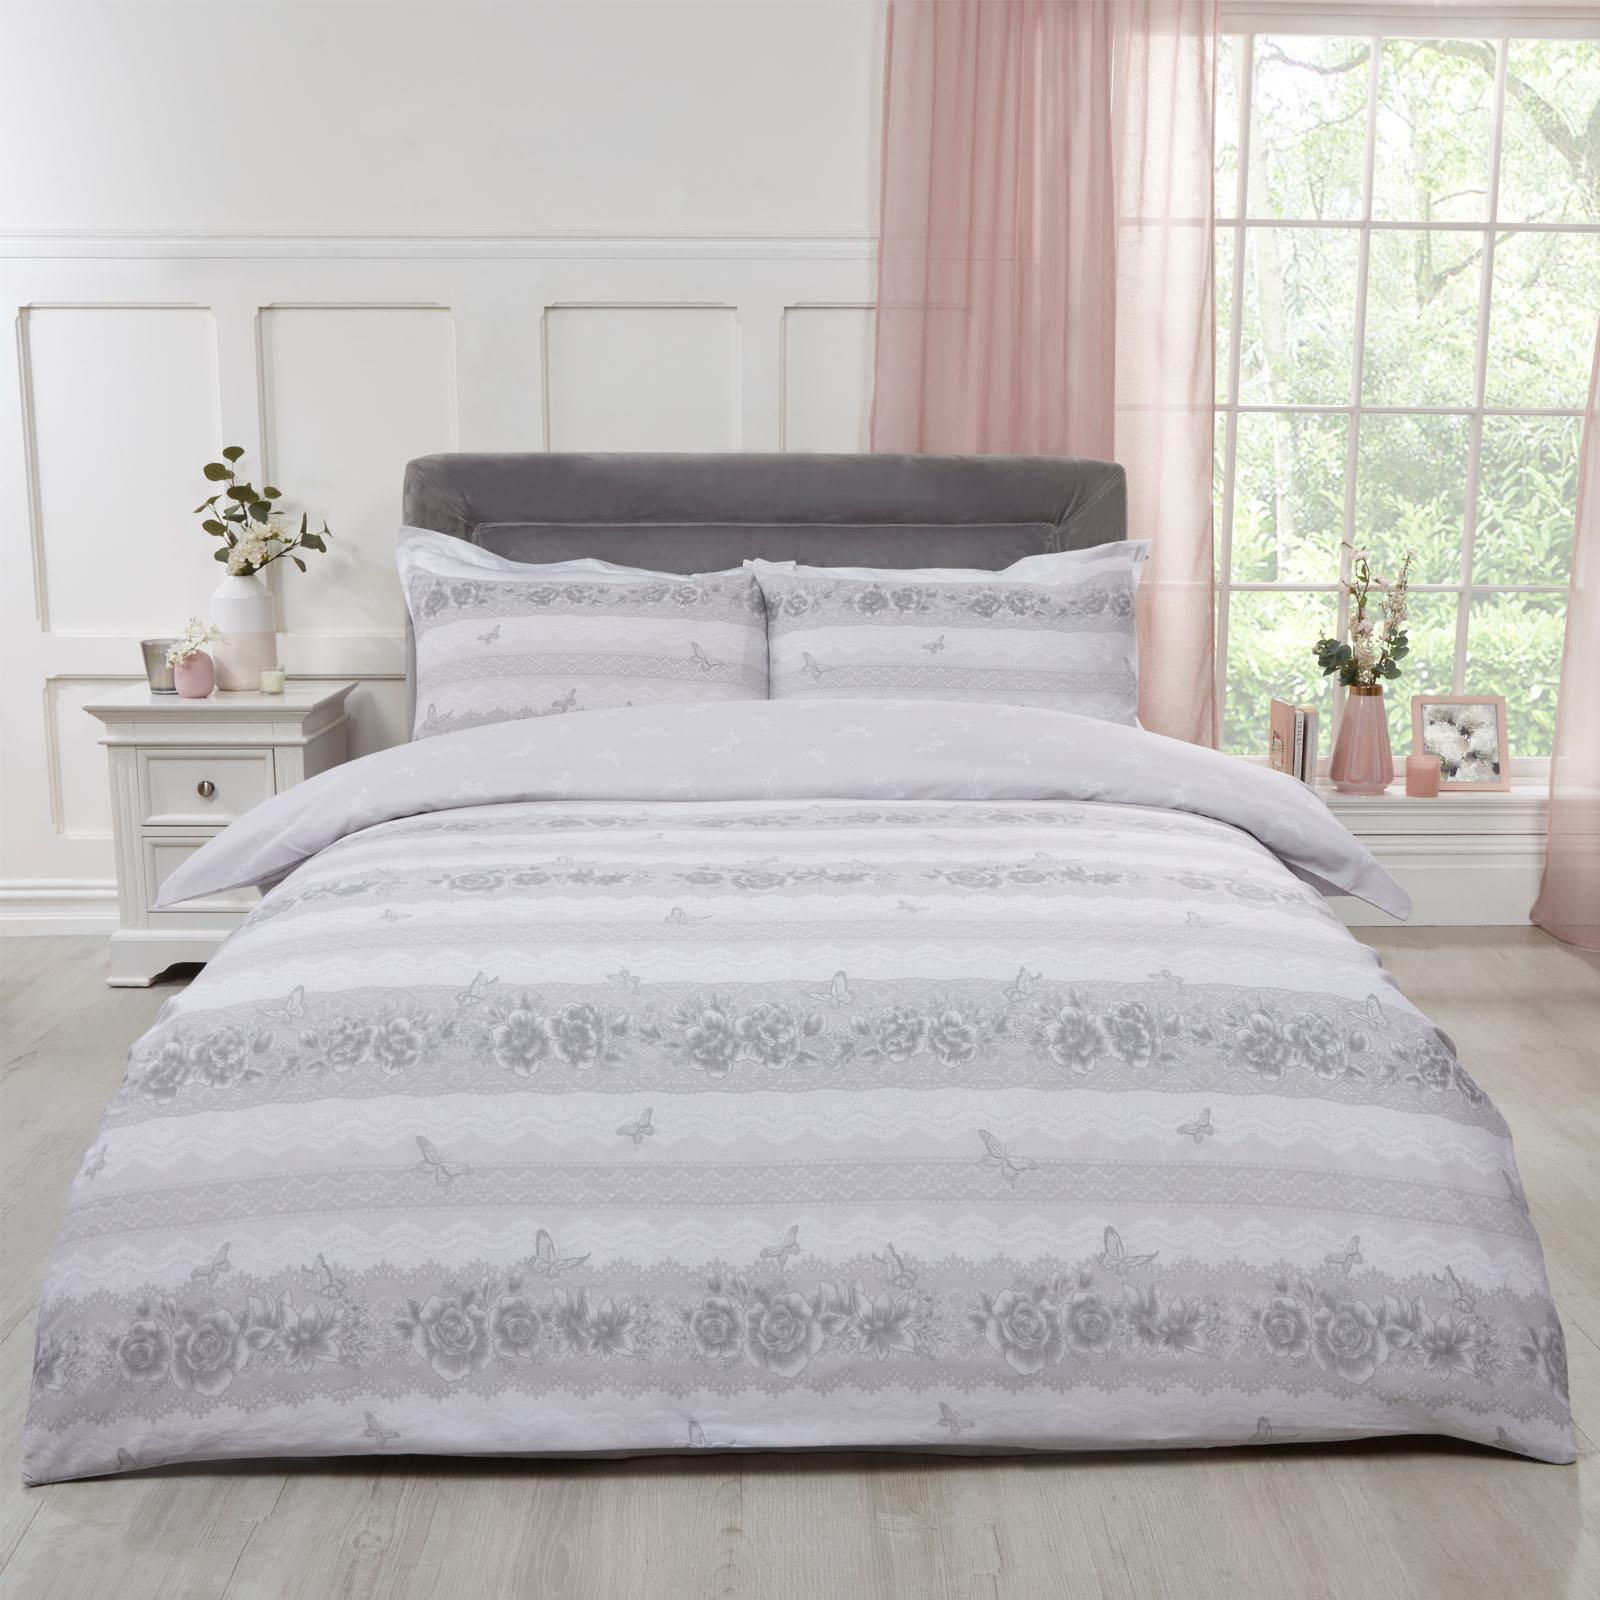 Bedding Sets Duvet Covers Stars Grey White Blush Pink Reversible Polycotton Bedding Duvet Cover Pillowcase Home Furniture Diy Tohoku Morinagamilk Co Jp